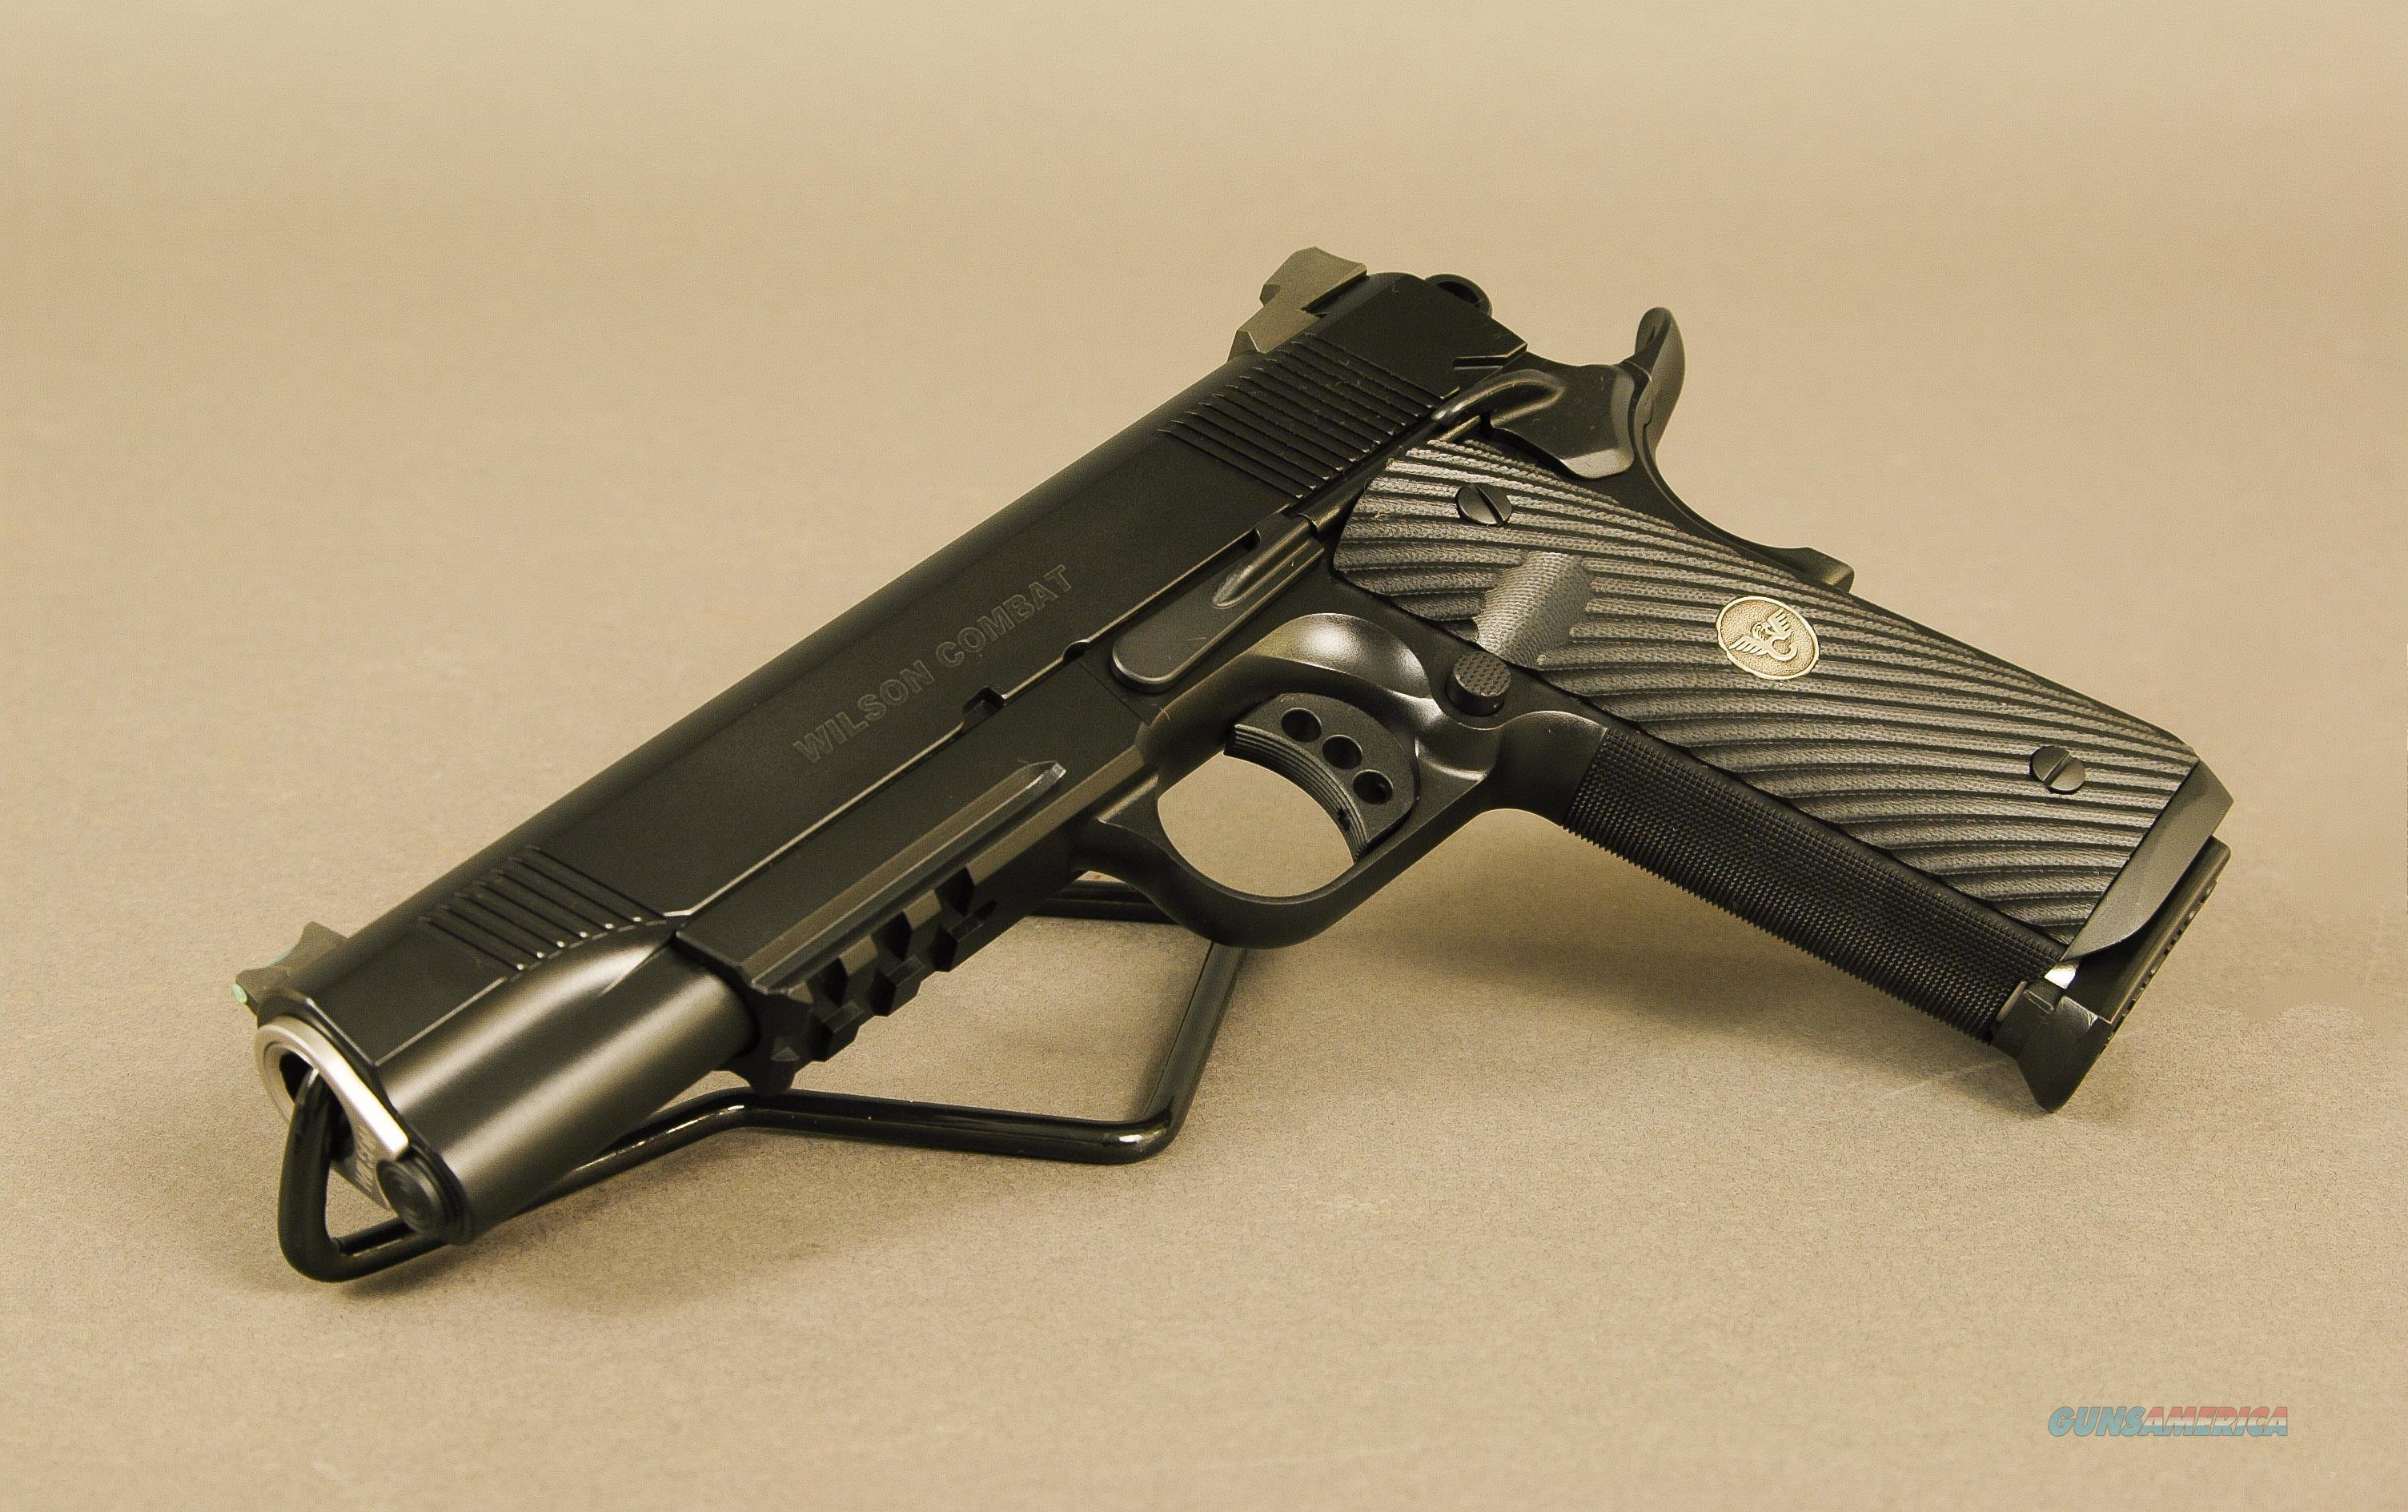 Wilson Combat CQB Elite 45ACP Armor-Tuff   Guns > Pistols > Wilson Combat Pistols